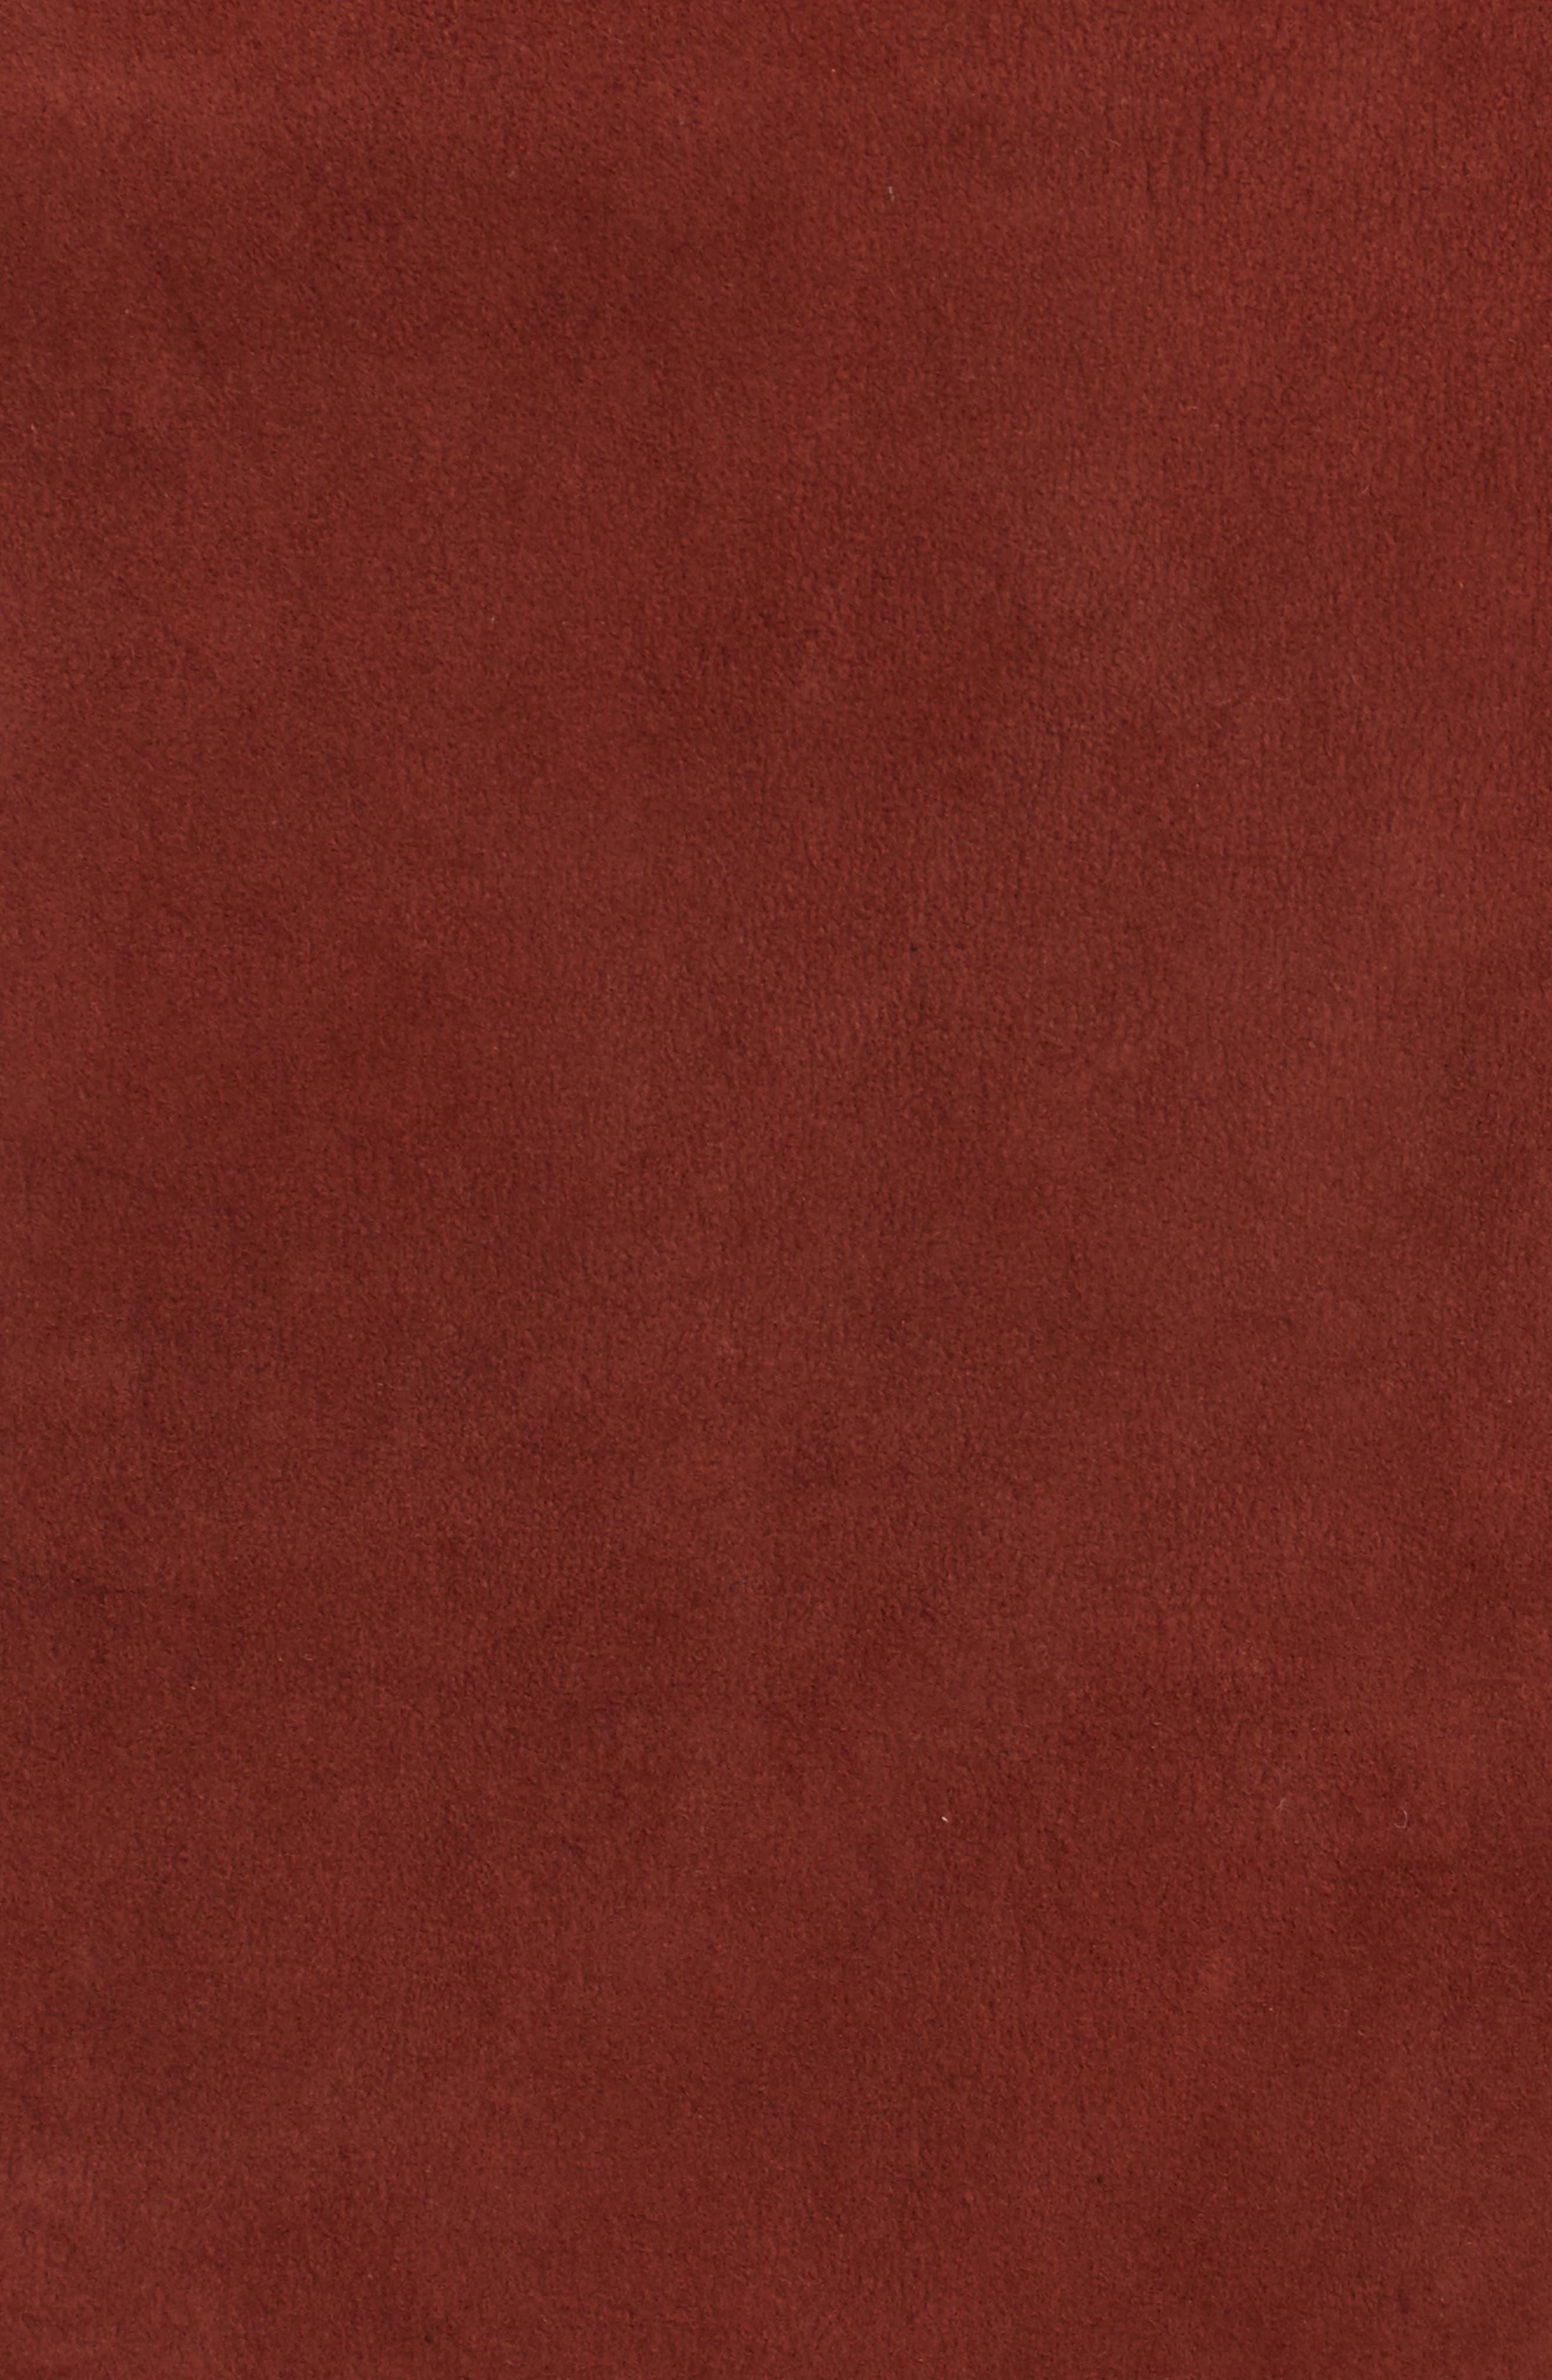 Morene Stretch Suede Jacket,                             Alternate thumbnail 6, color,                             219